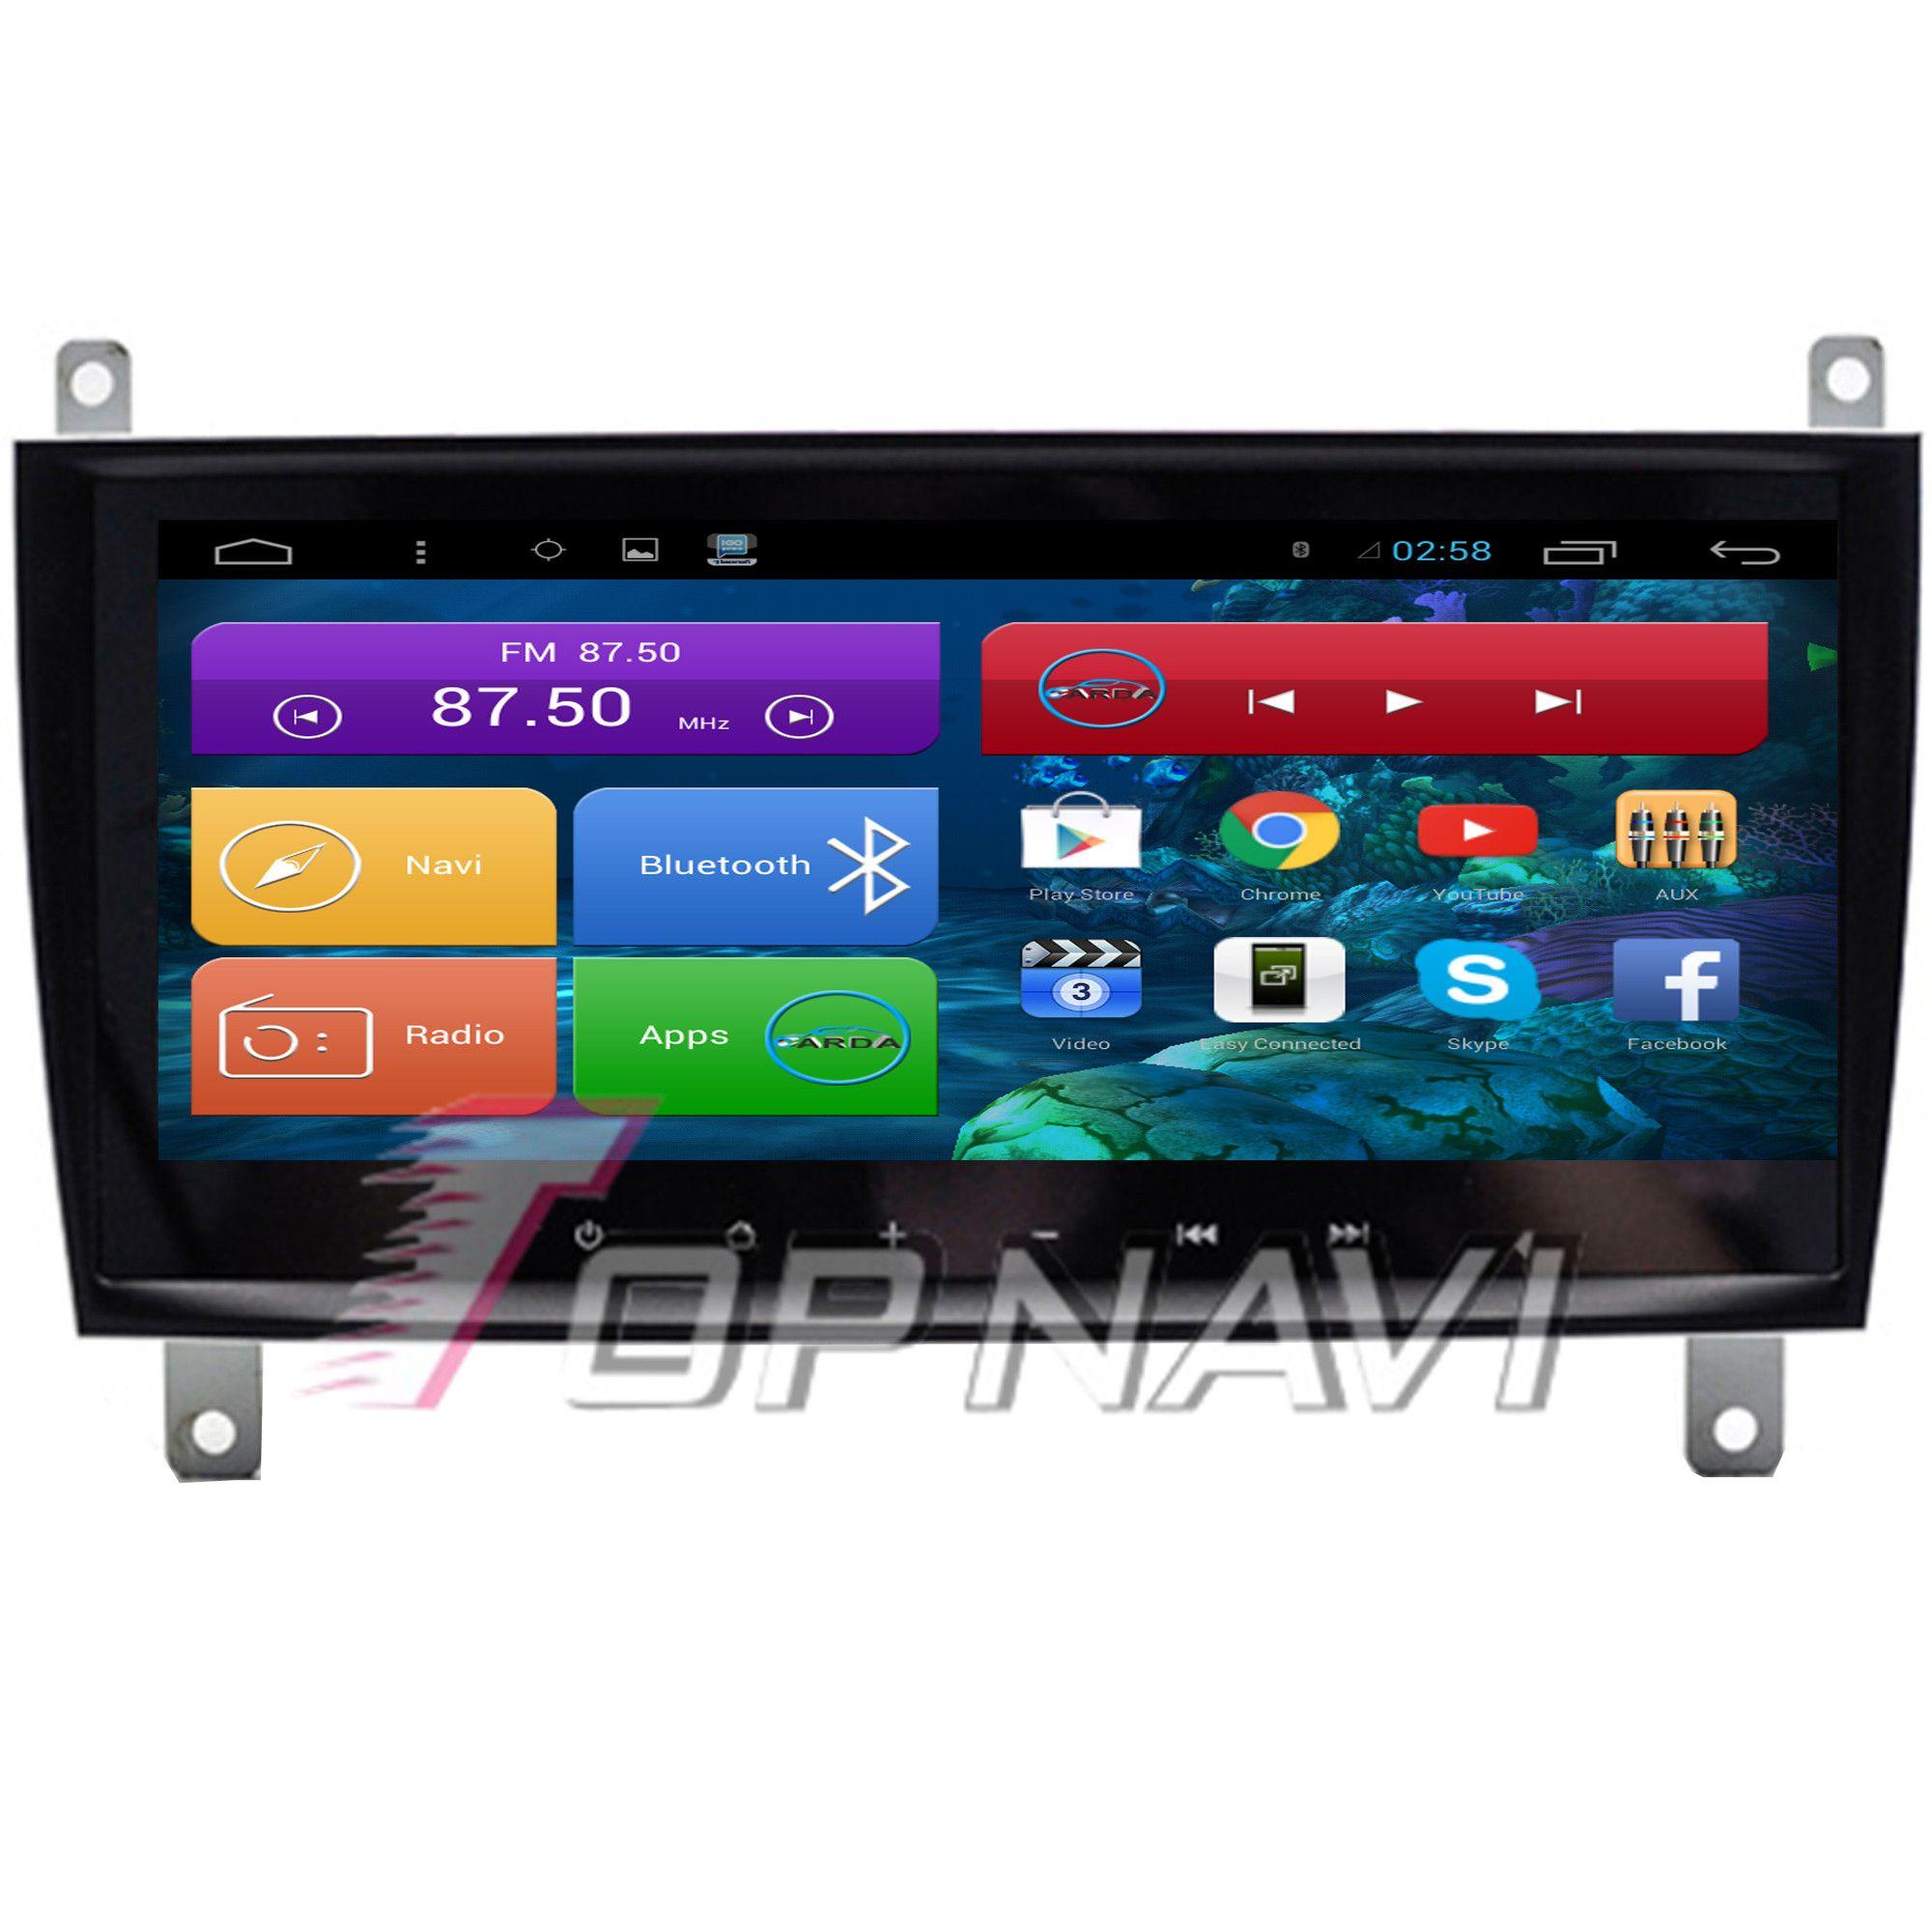 Topnavi 8,8 Quad Core Android 6.0 Auto GPS-Navigation für Benz CLK Autoradio Audio Stereo, KEINE DVD-